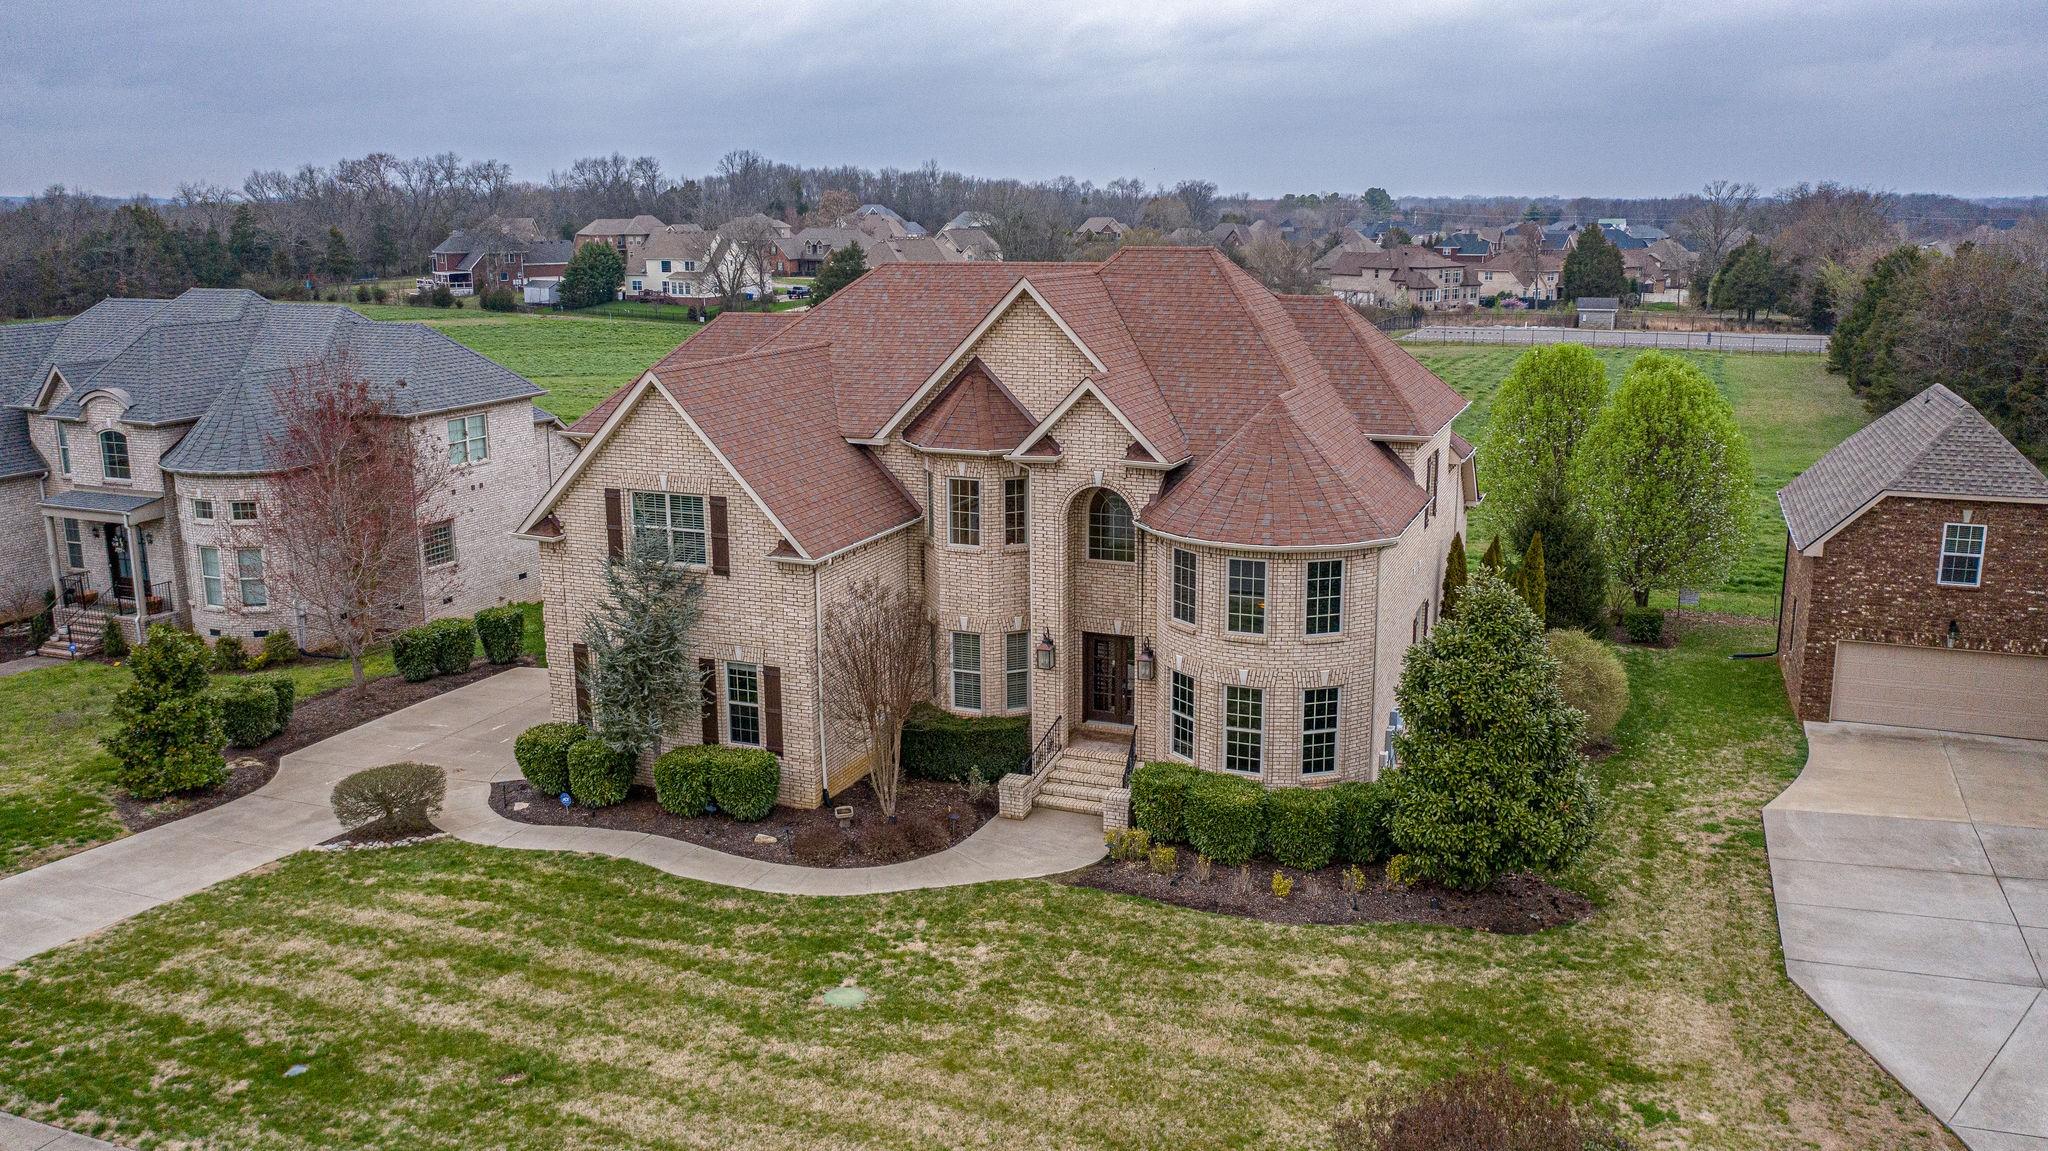 1204 Twin View Dr, Murfreesboro, TN 37128 - Murfreesboro, TN real estate listing